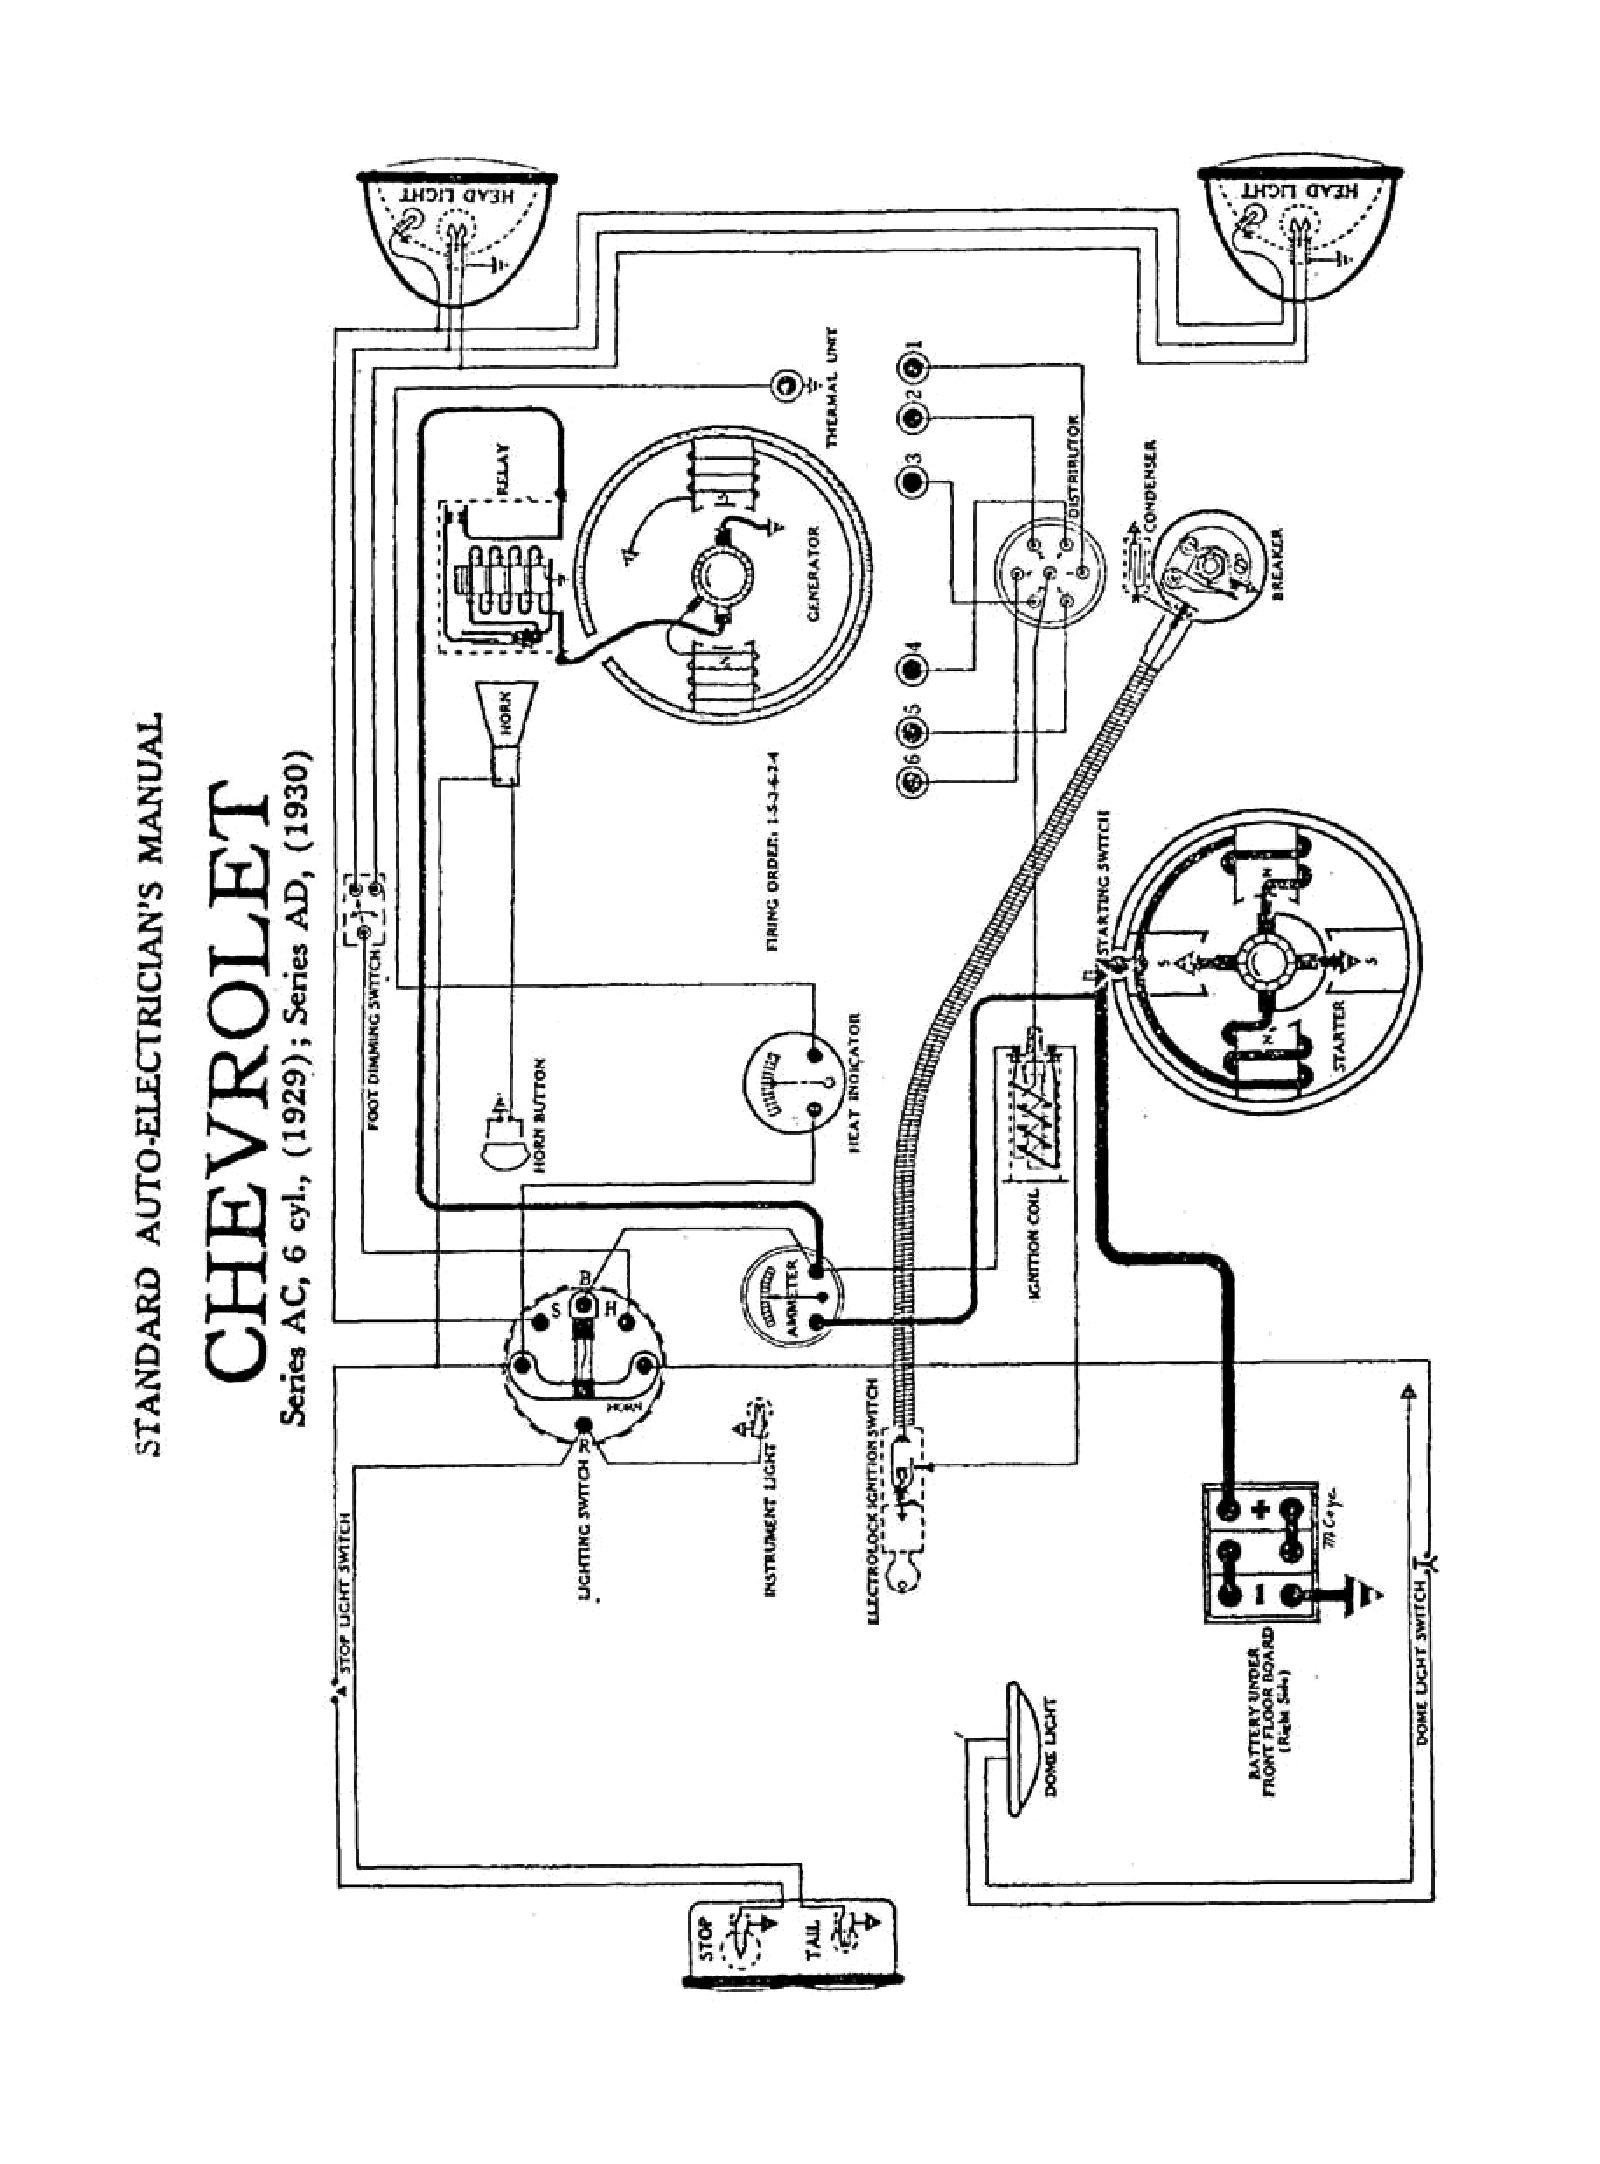 1950 desoto wiring diagram 1950 mercury wiring diagram flat head engines plymouth dodge desoto chrysler six and